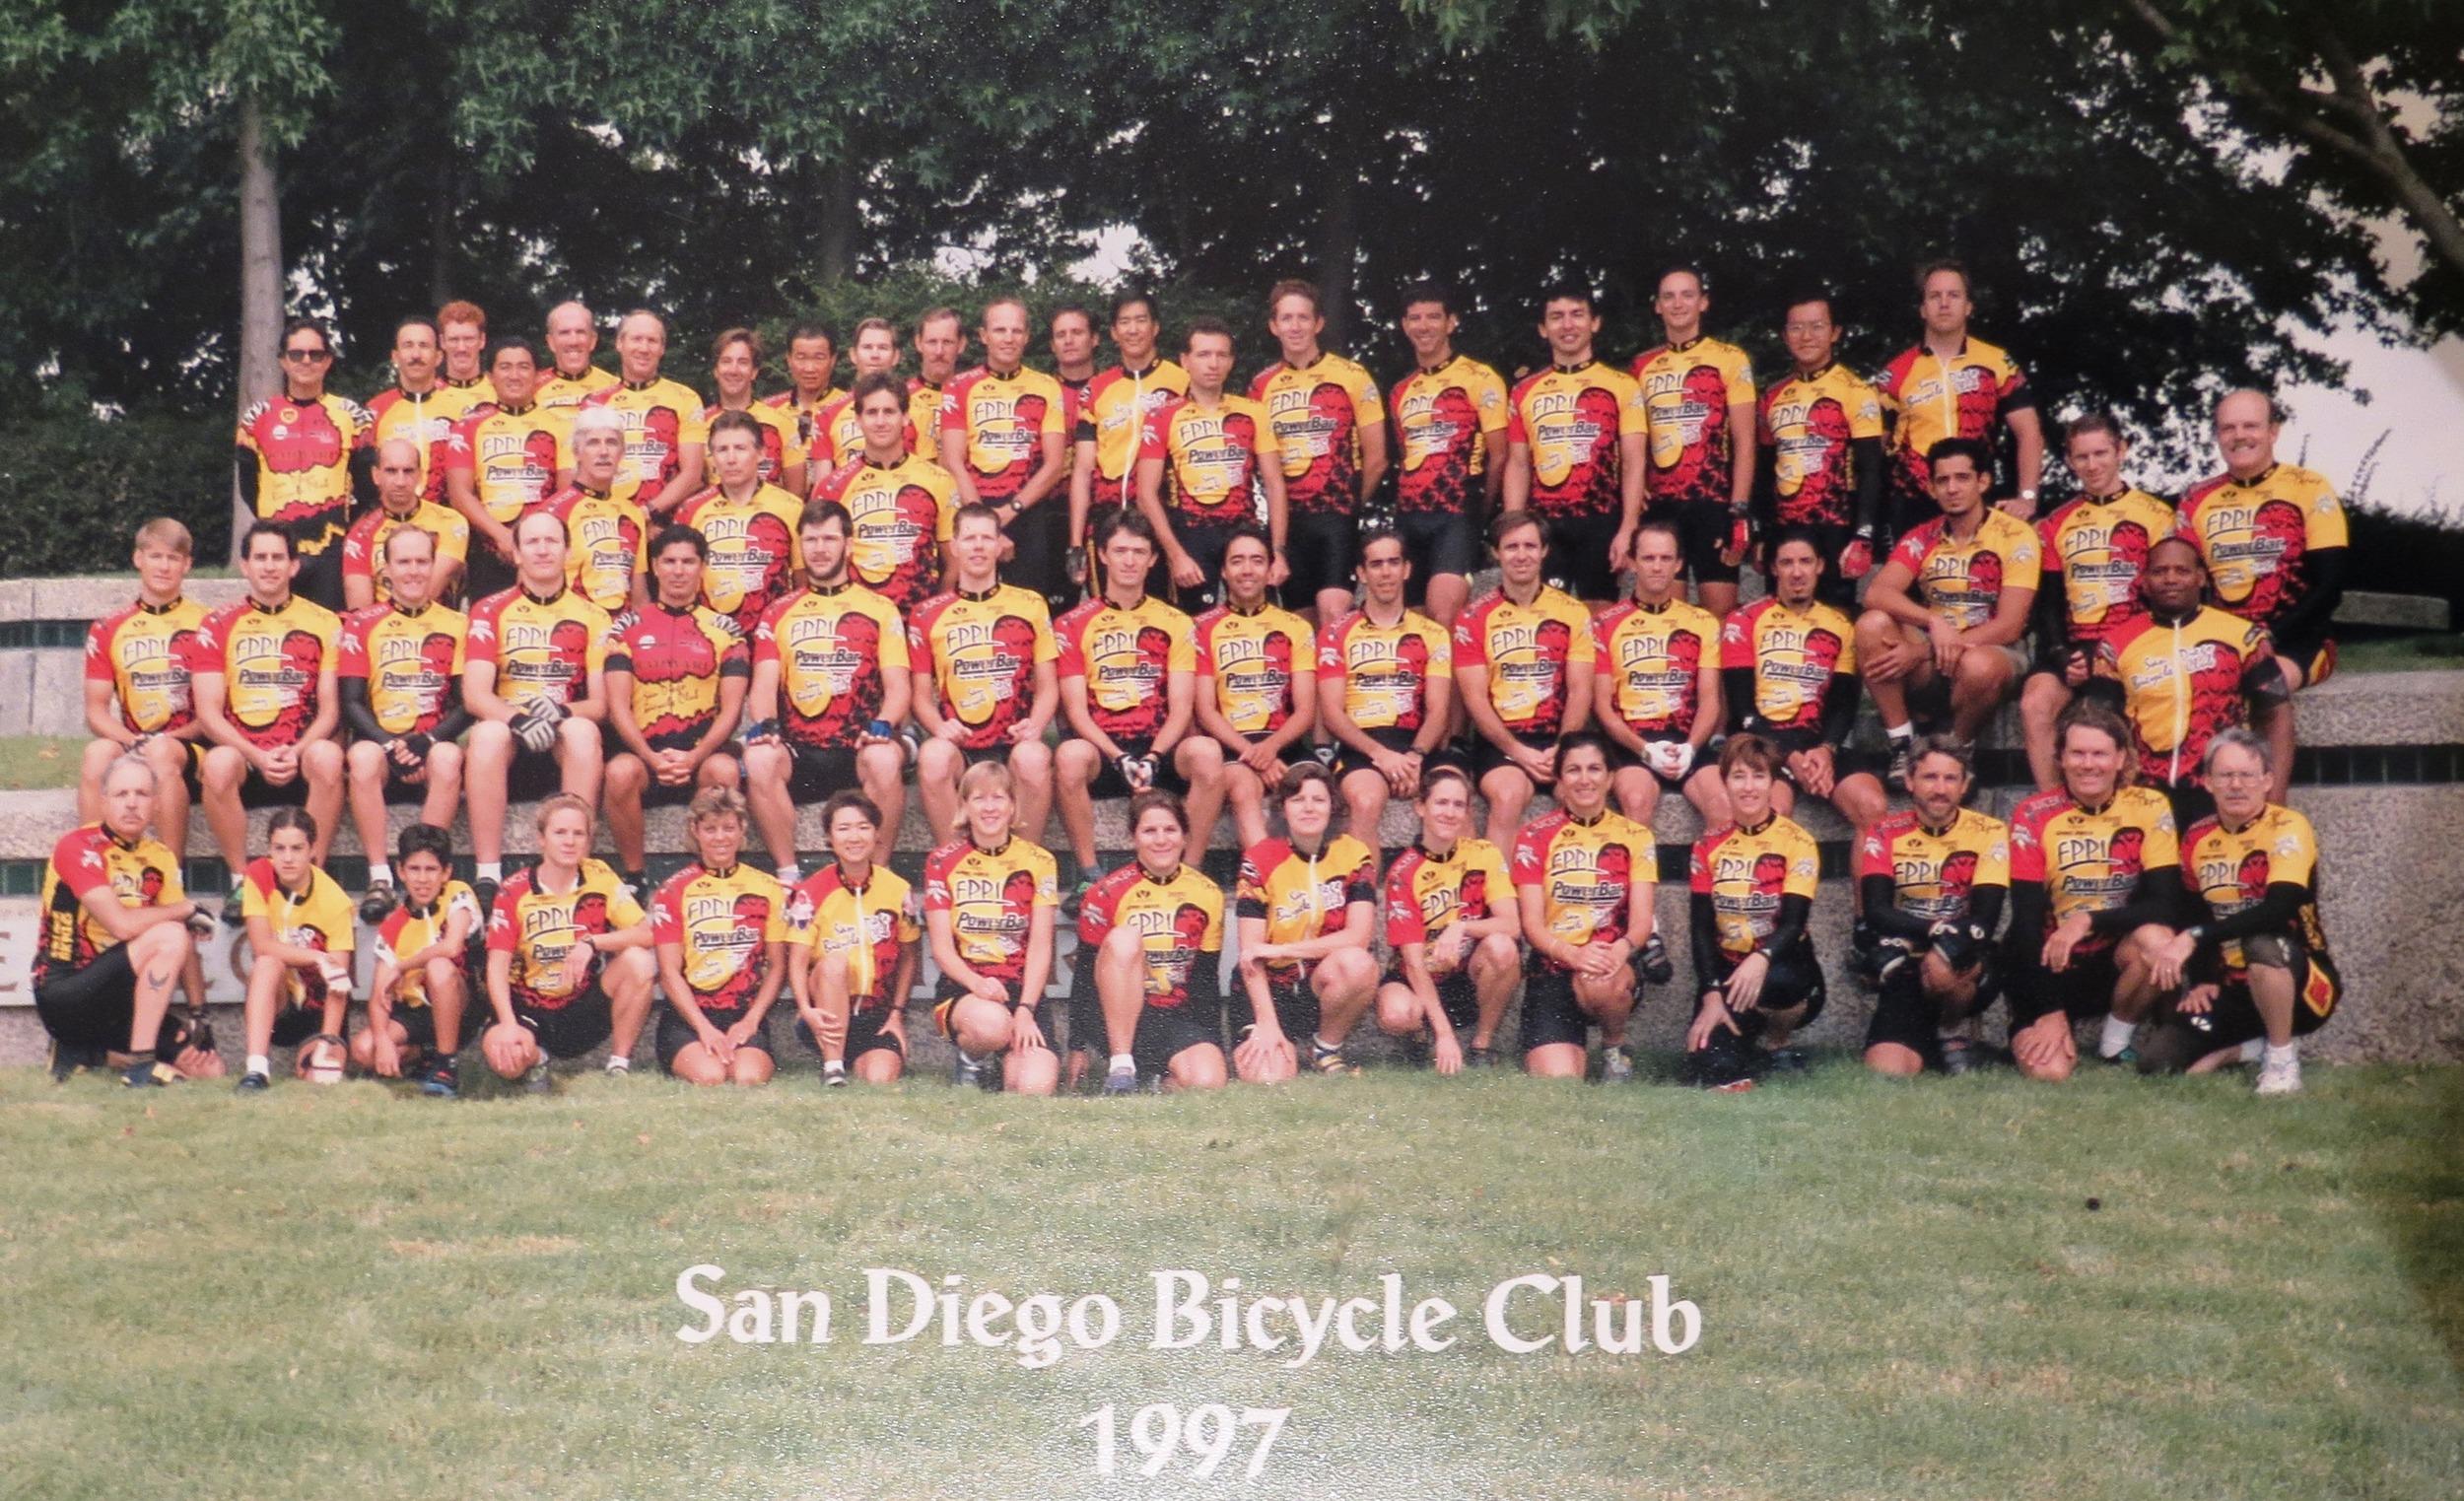 1997 Club Photo